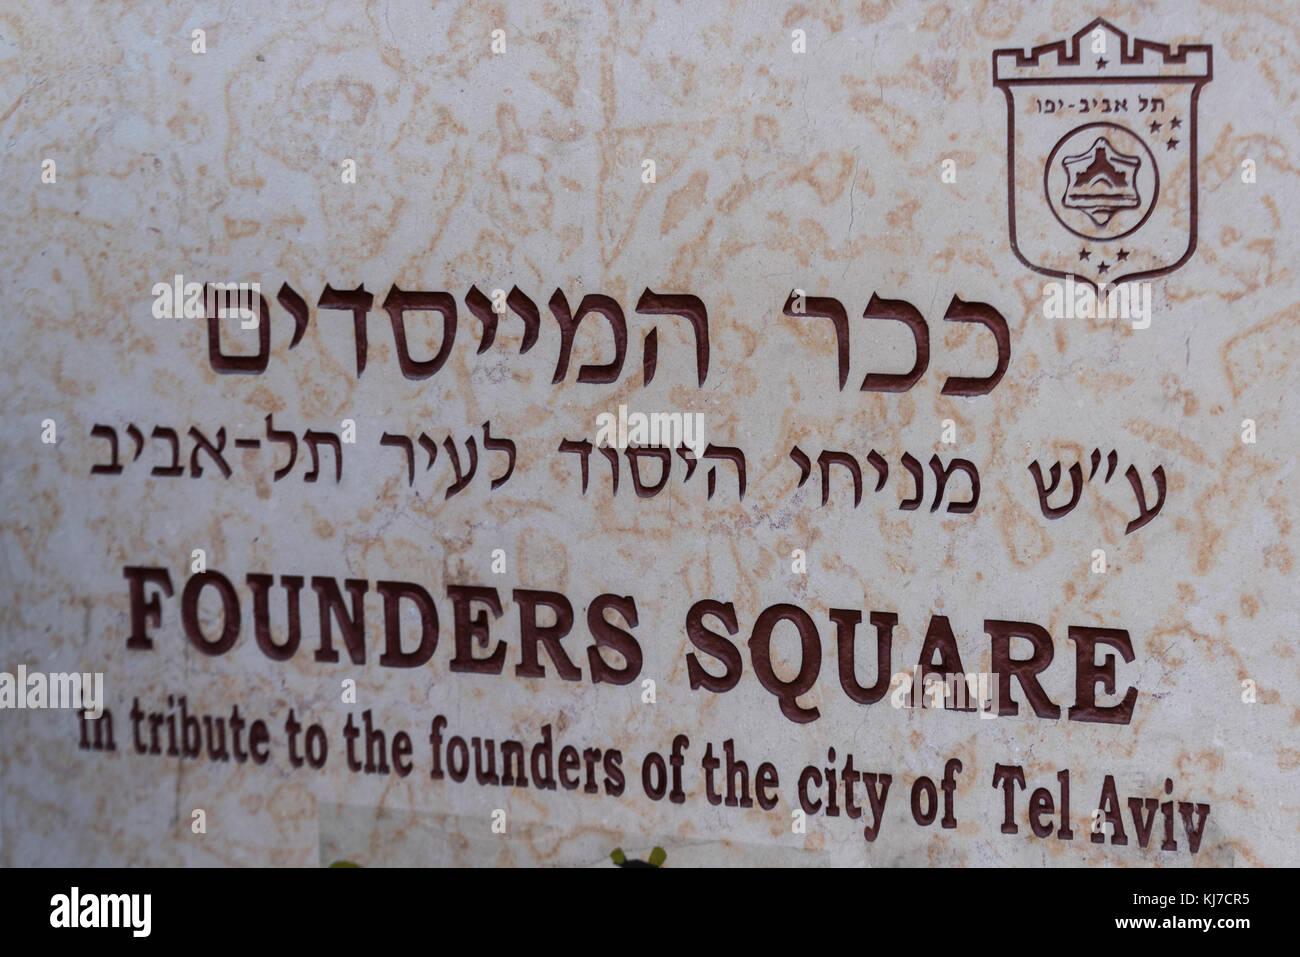 Close-up of memorial plaque, Founders Square, Rothschild Boulevard, Tel Aviv, Israel - Stock Image